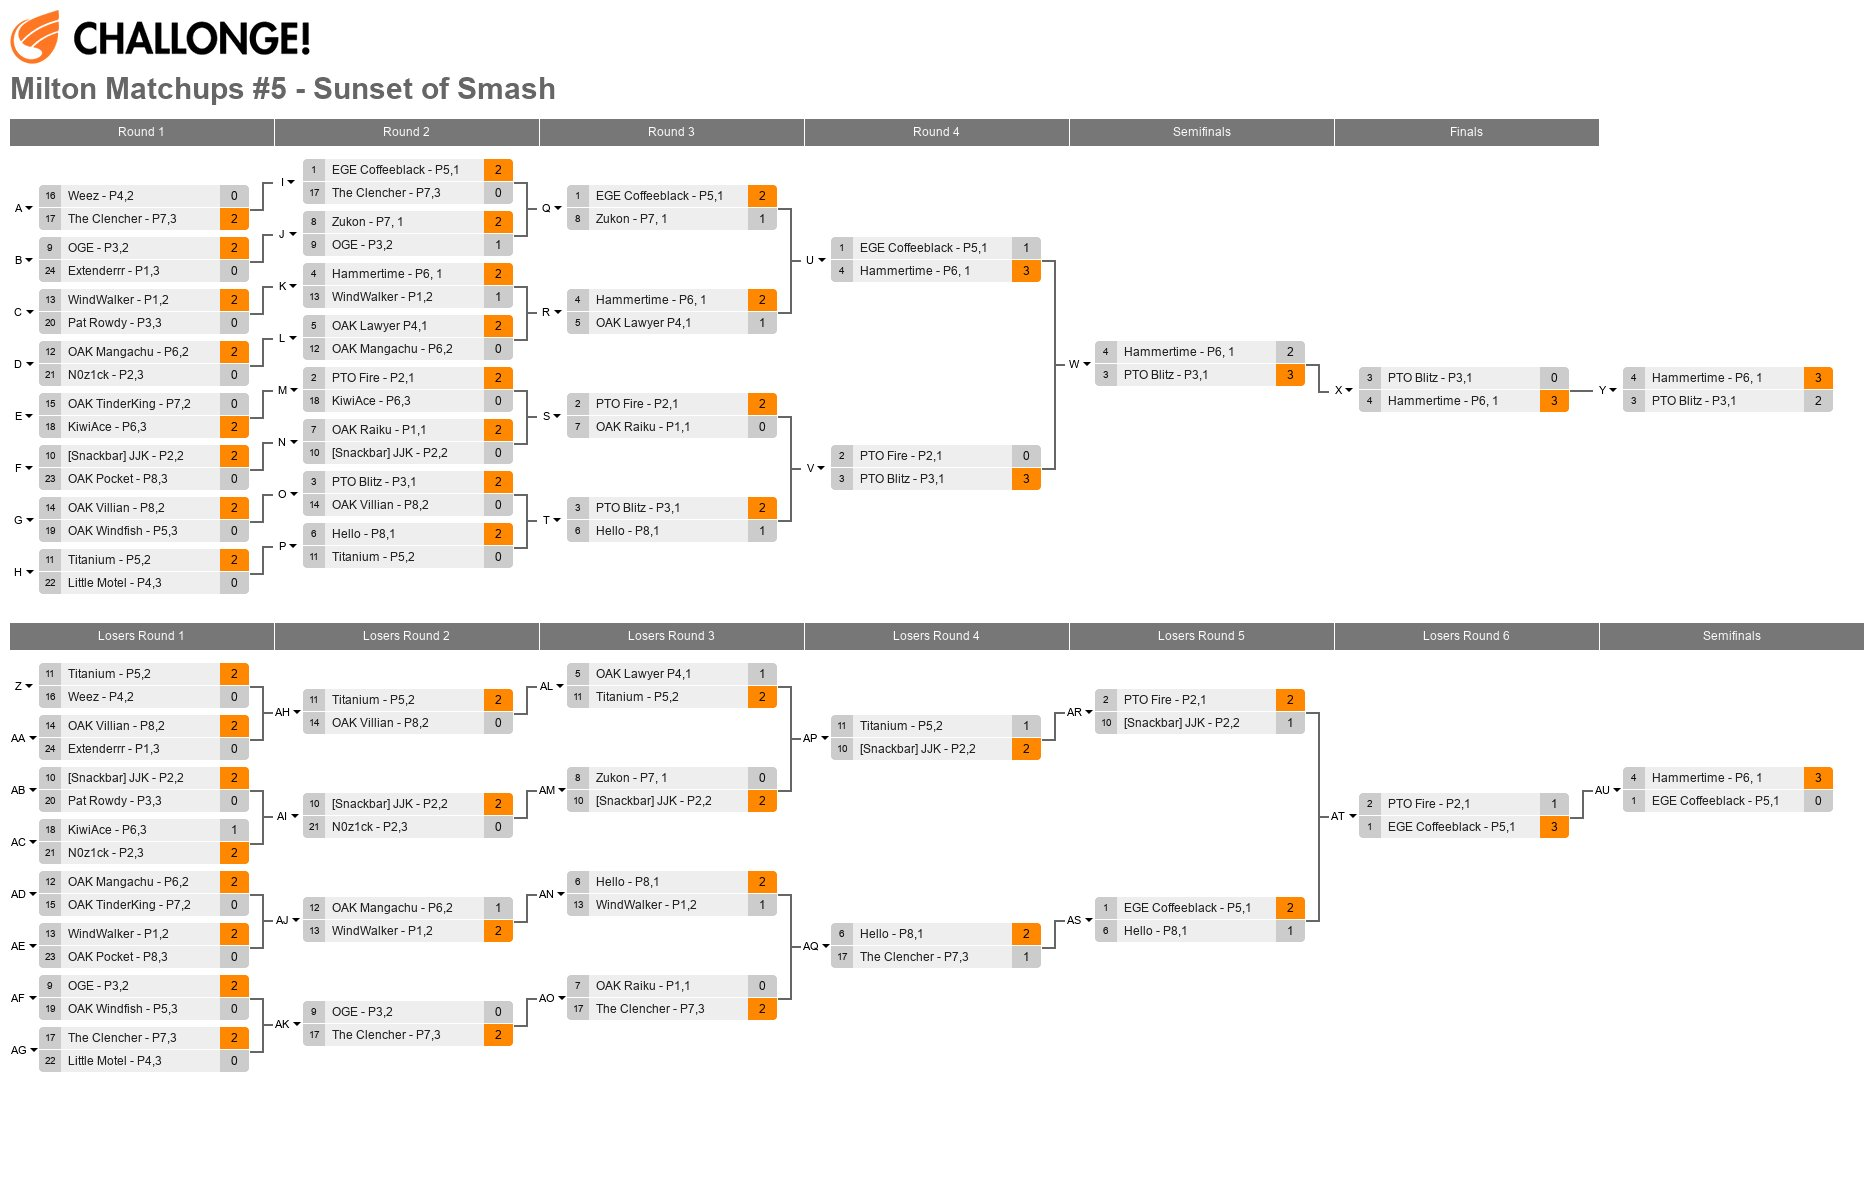 Milton Matchups #5 - Sunset of Smash - Top 24 Bracket (35 Entrants)